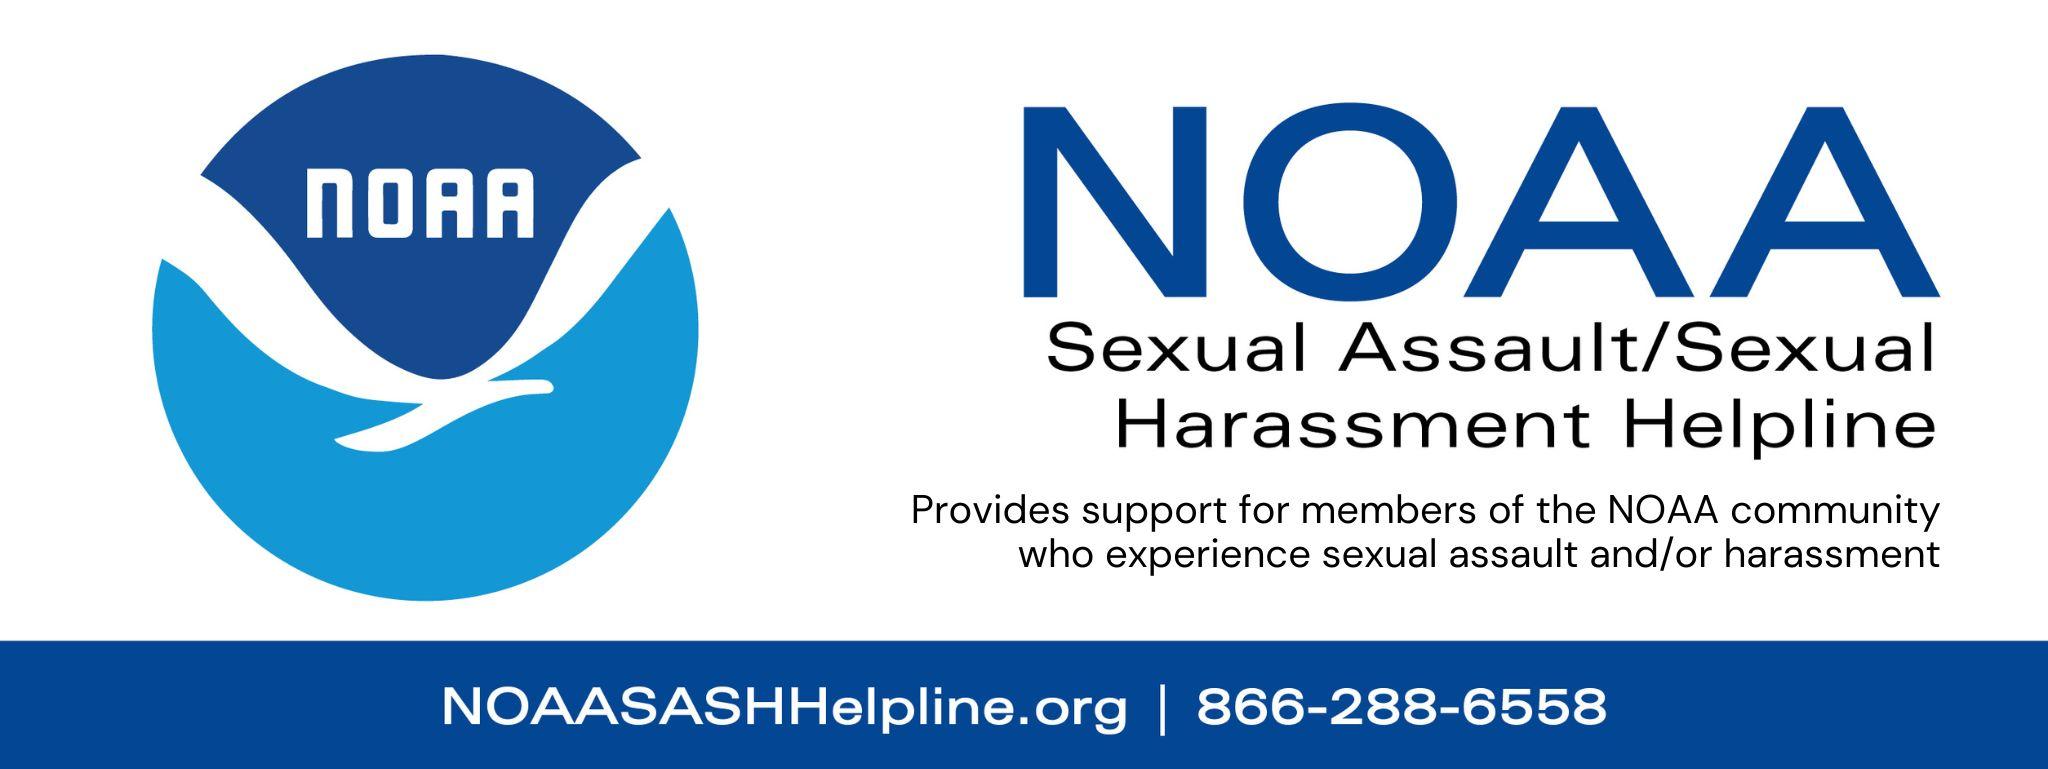 Sexual health hotline vancouver